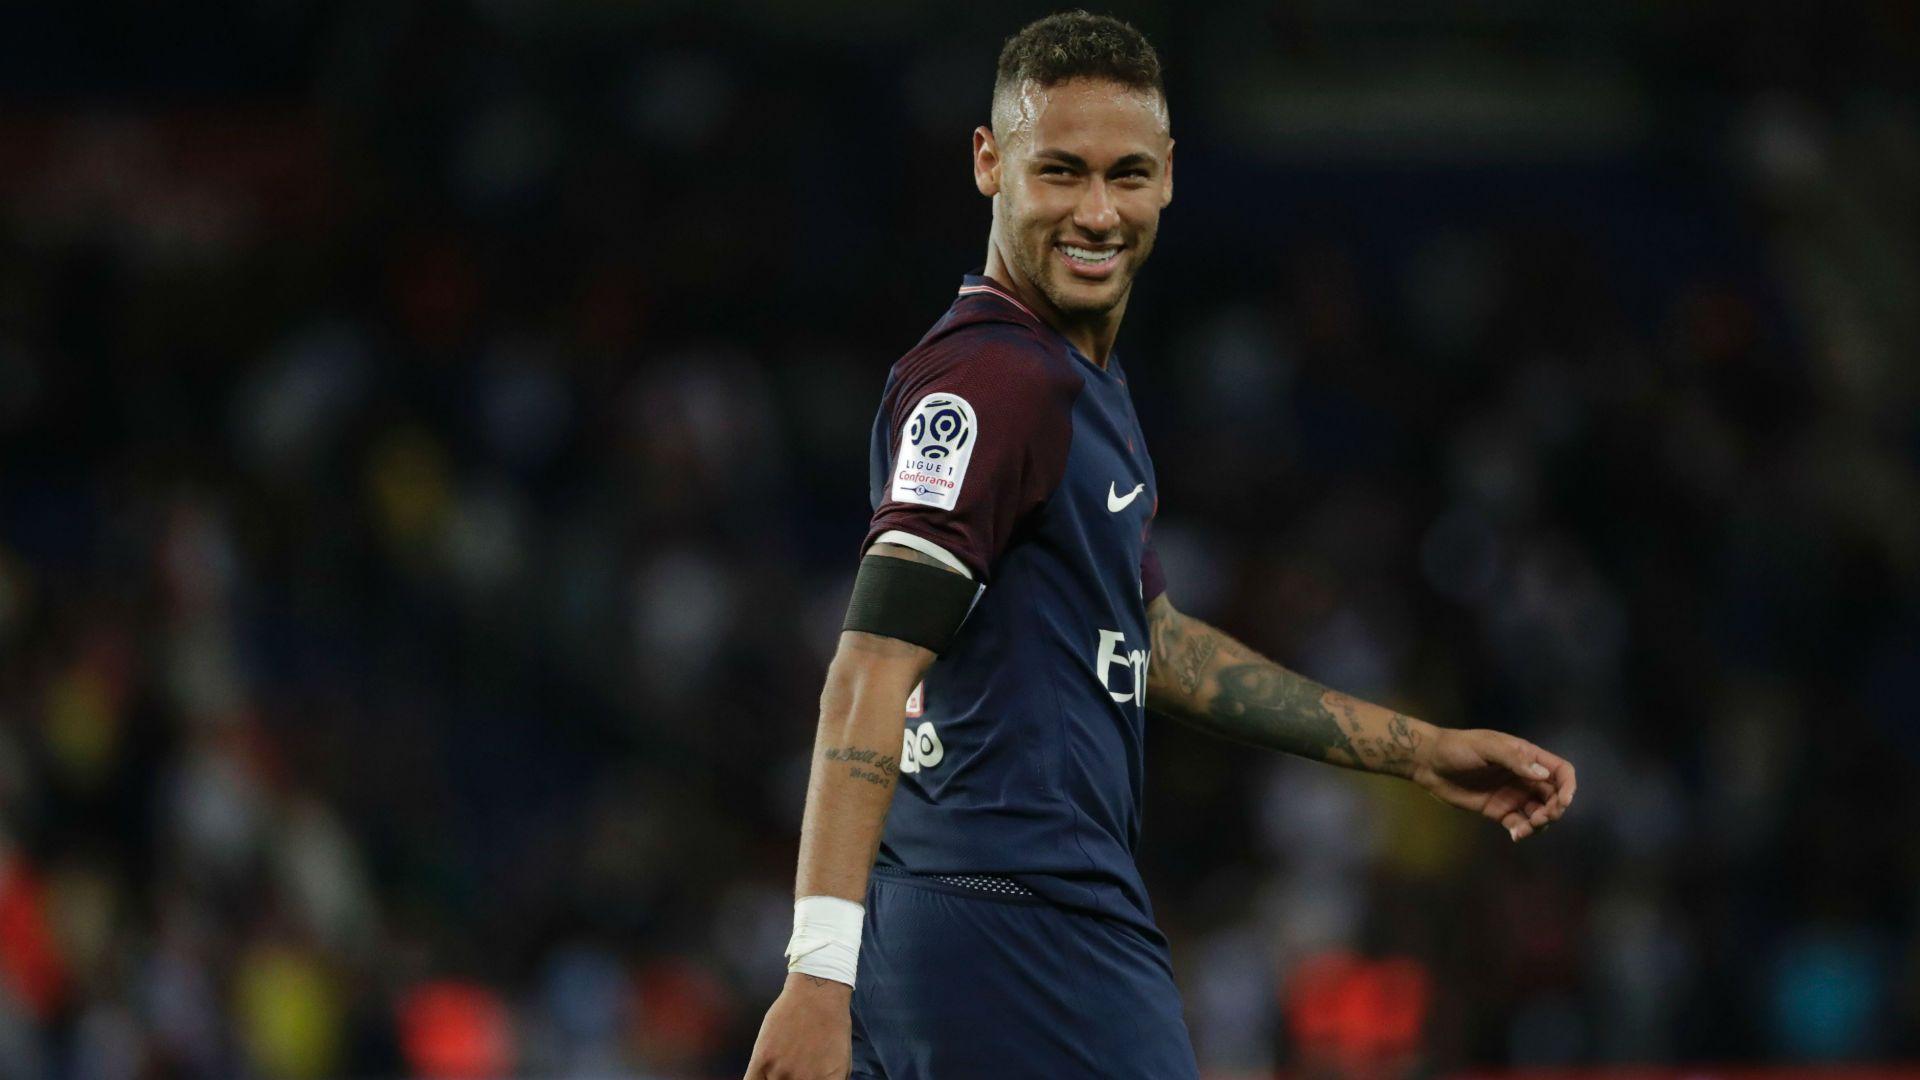 Pin by Shasha on Neymar Jr Neymar, Psg, Sports